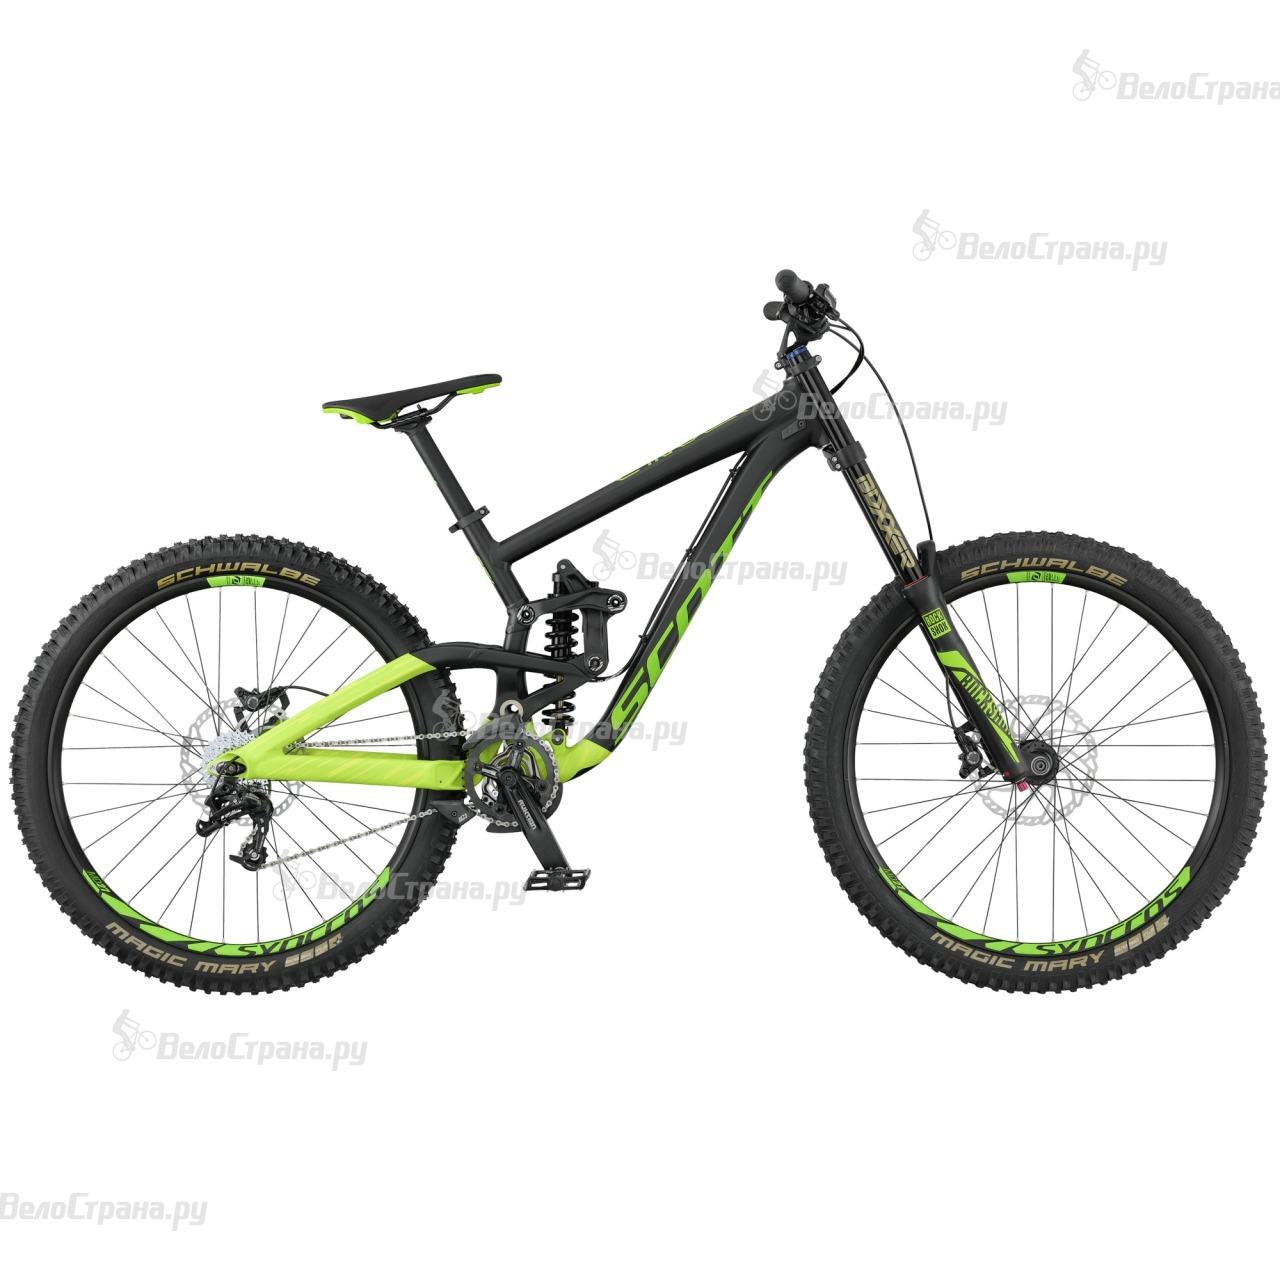 Велосипед Scott Gambler 730 (2017) велосипед scott gambler 720 2015